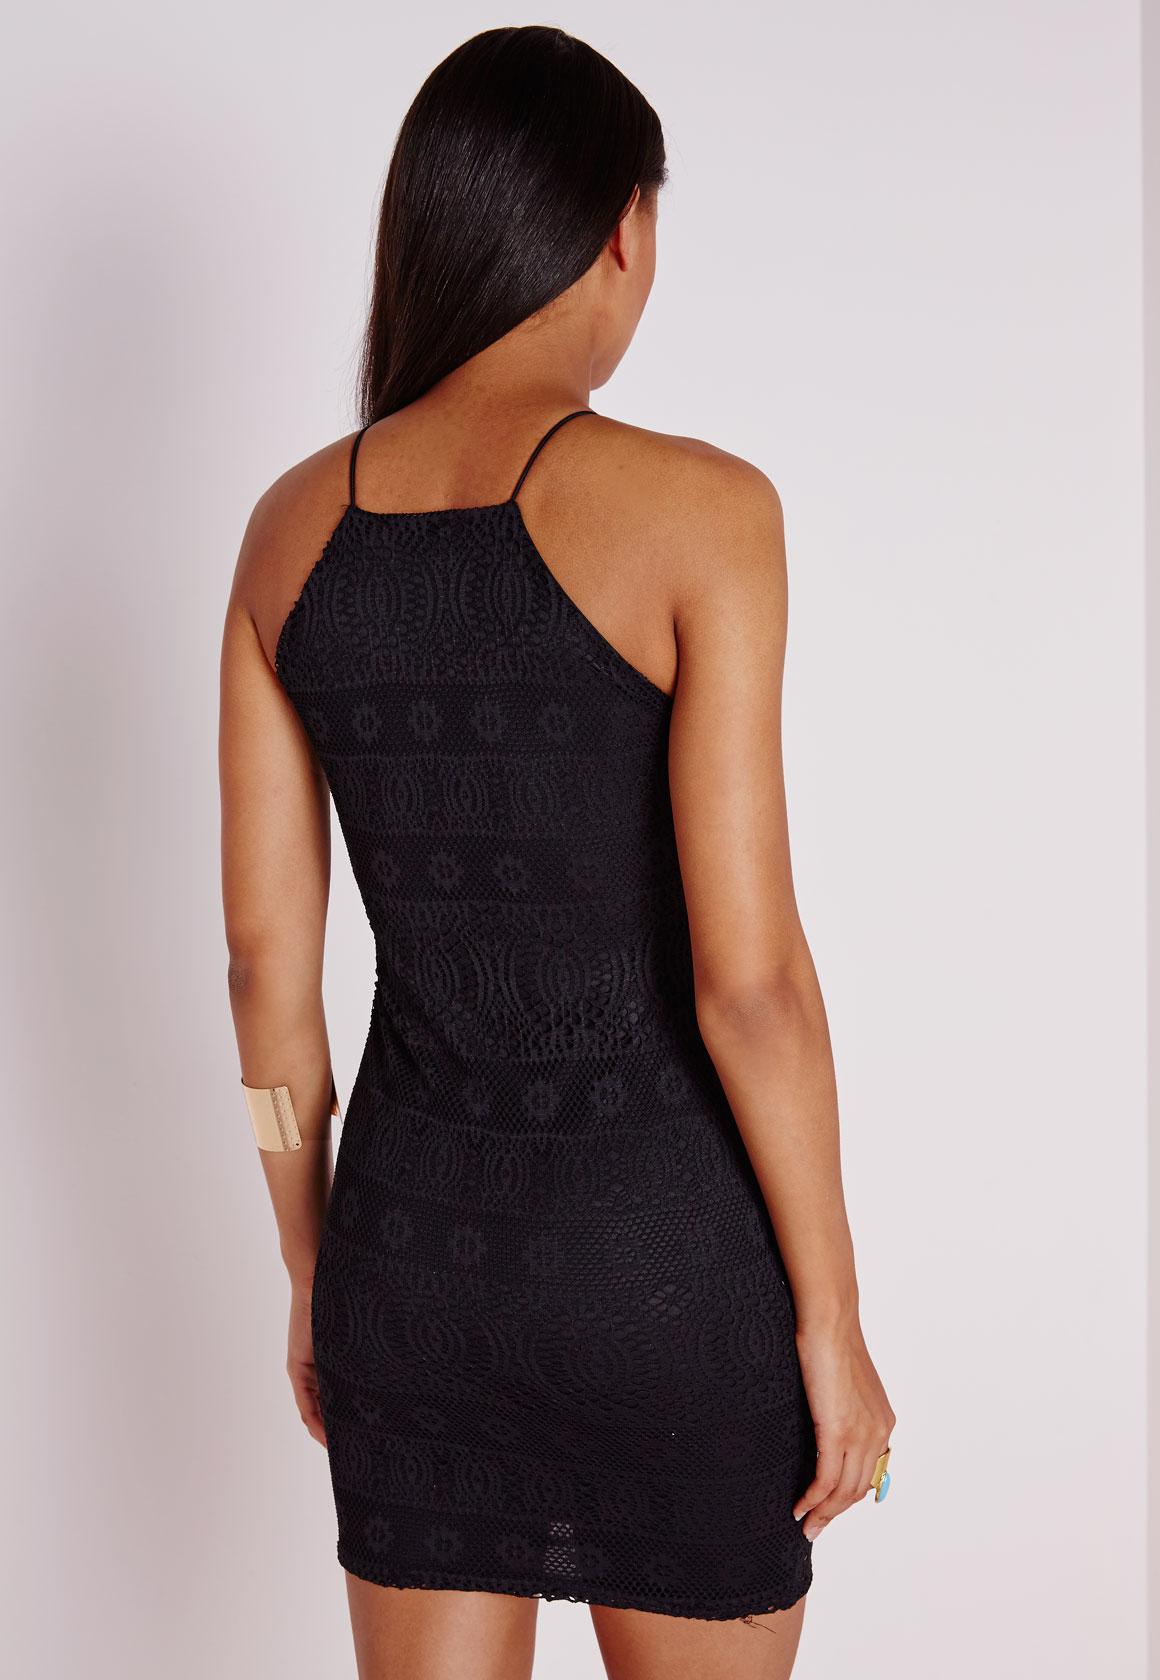 Knee black strappy straight neck bodycon dress nike macy's